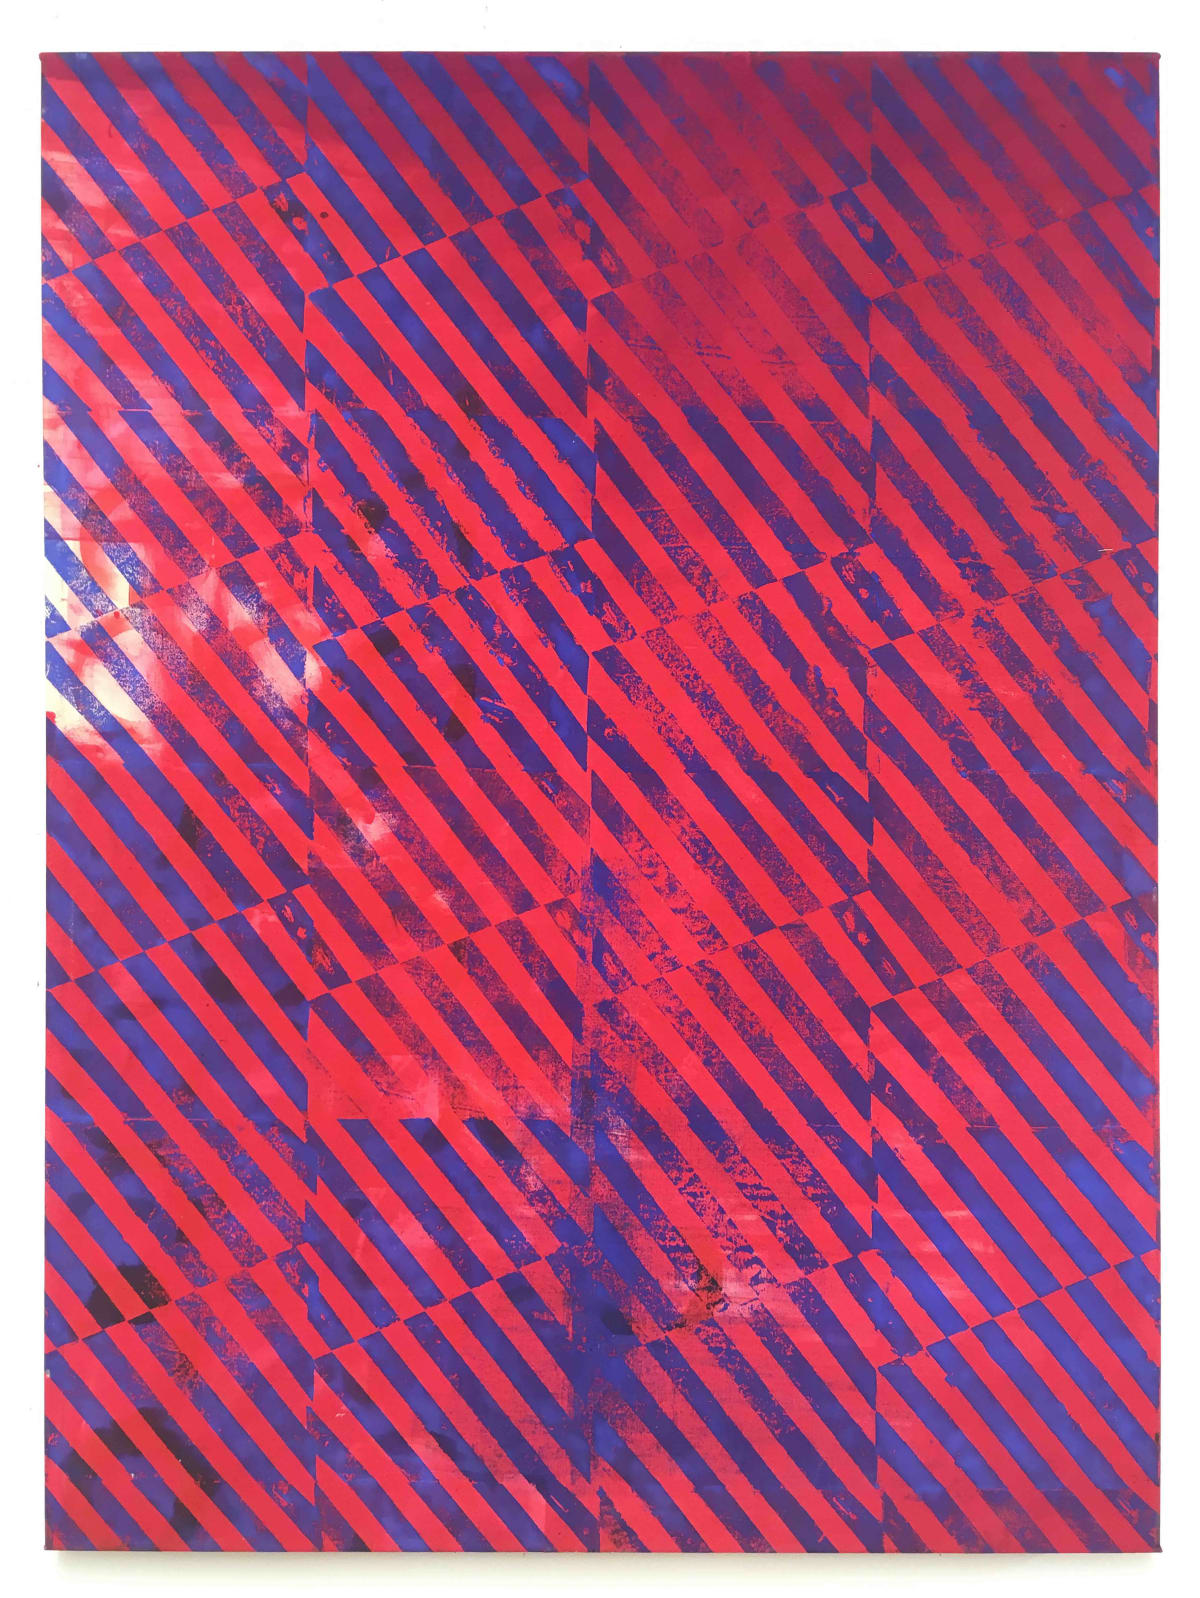 Dominic Beattie, Untitled, 2018